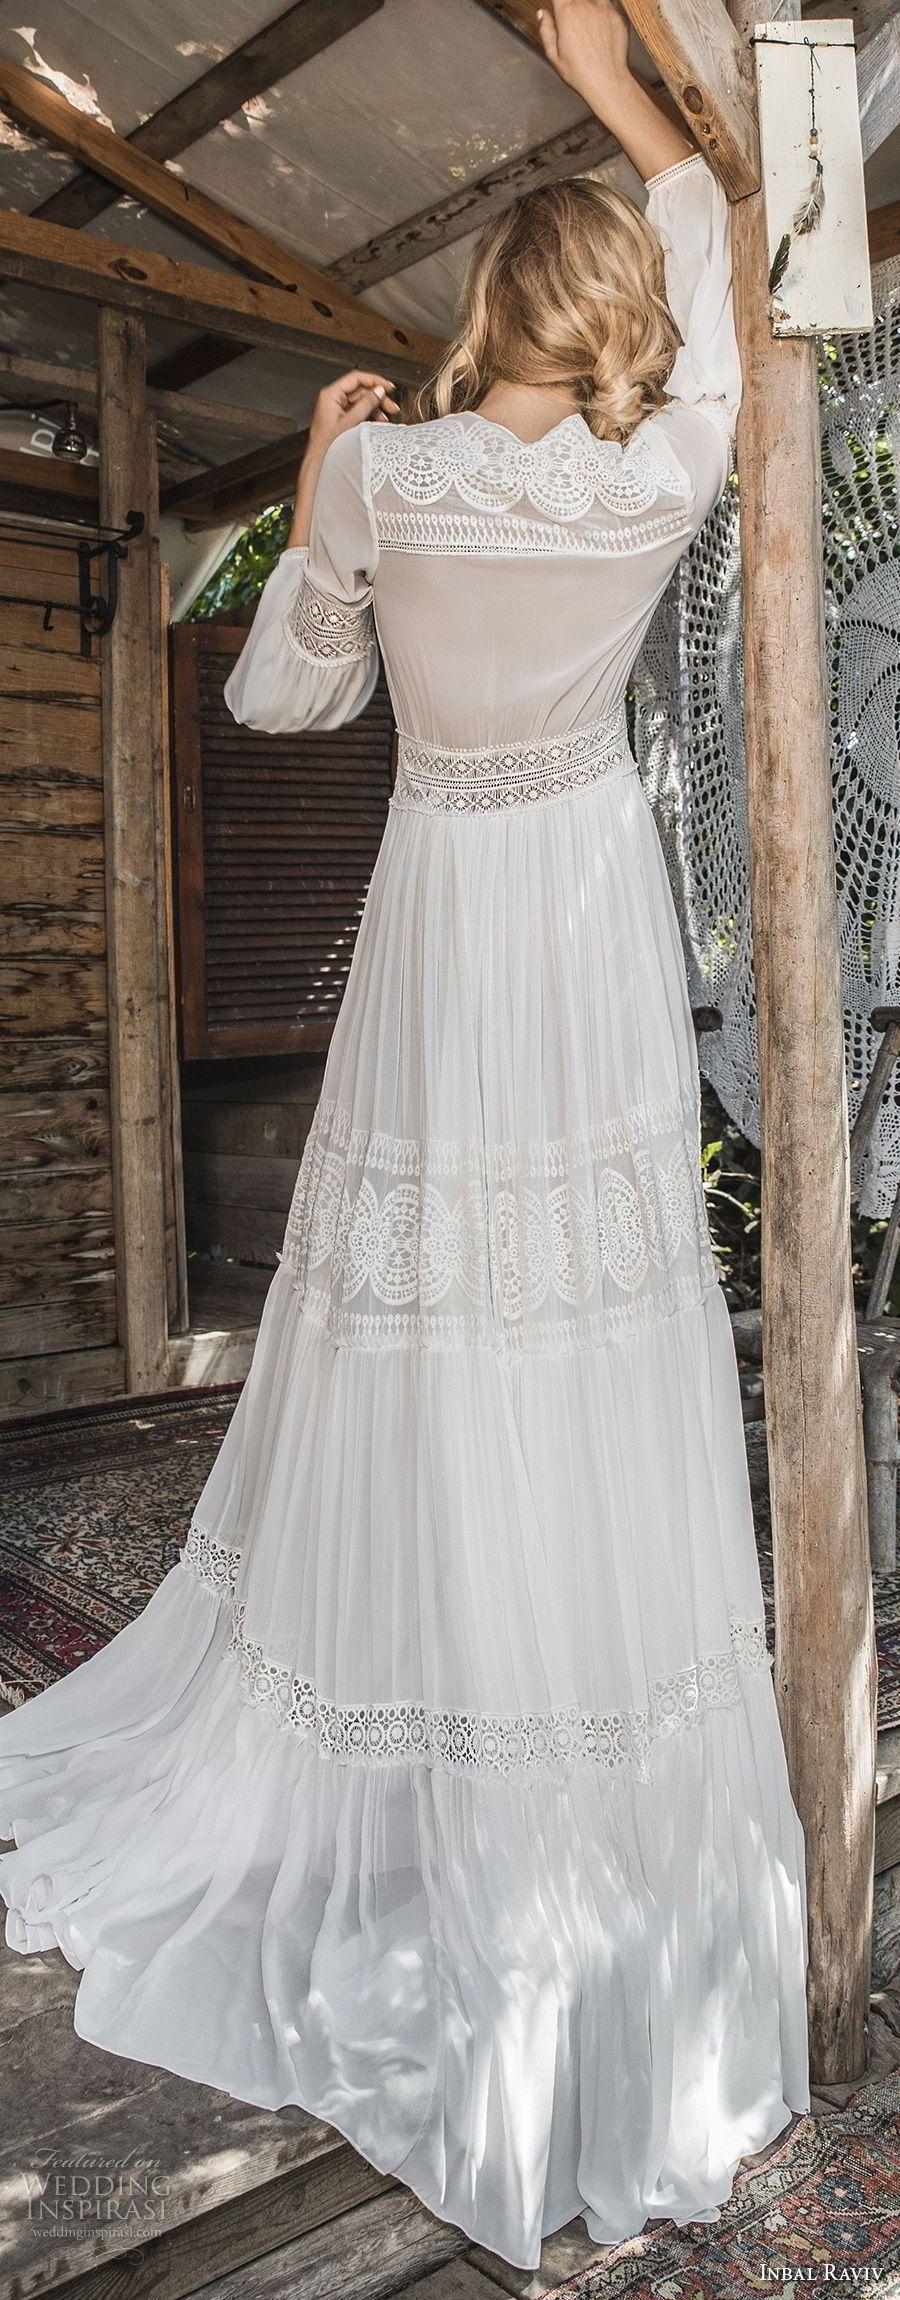 Inbal raviv bridal long sleeves deep v neck full lace